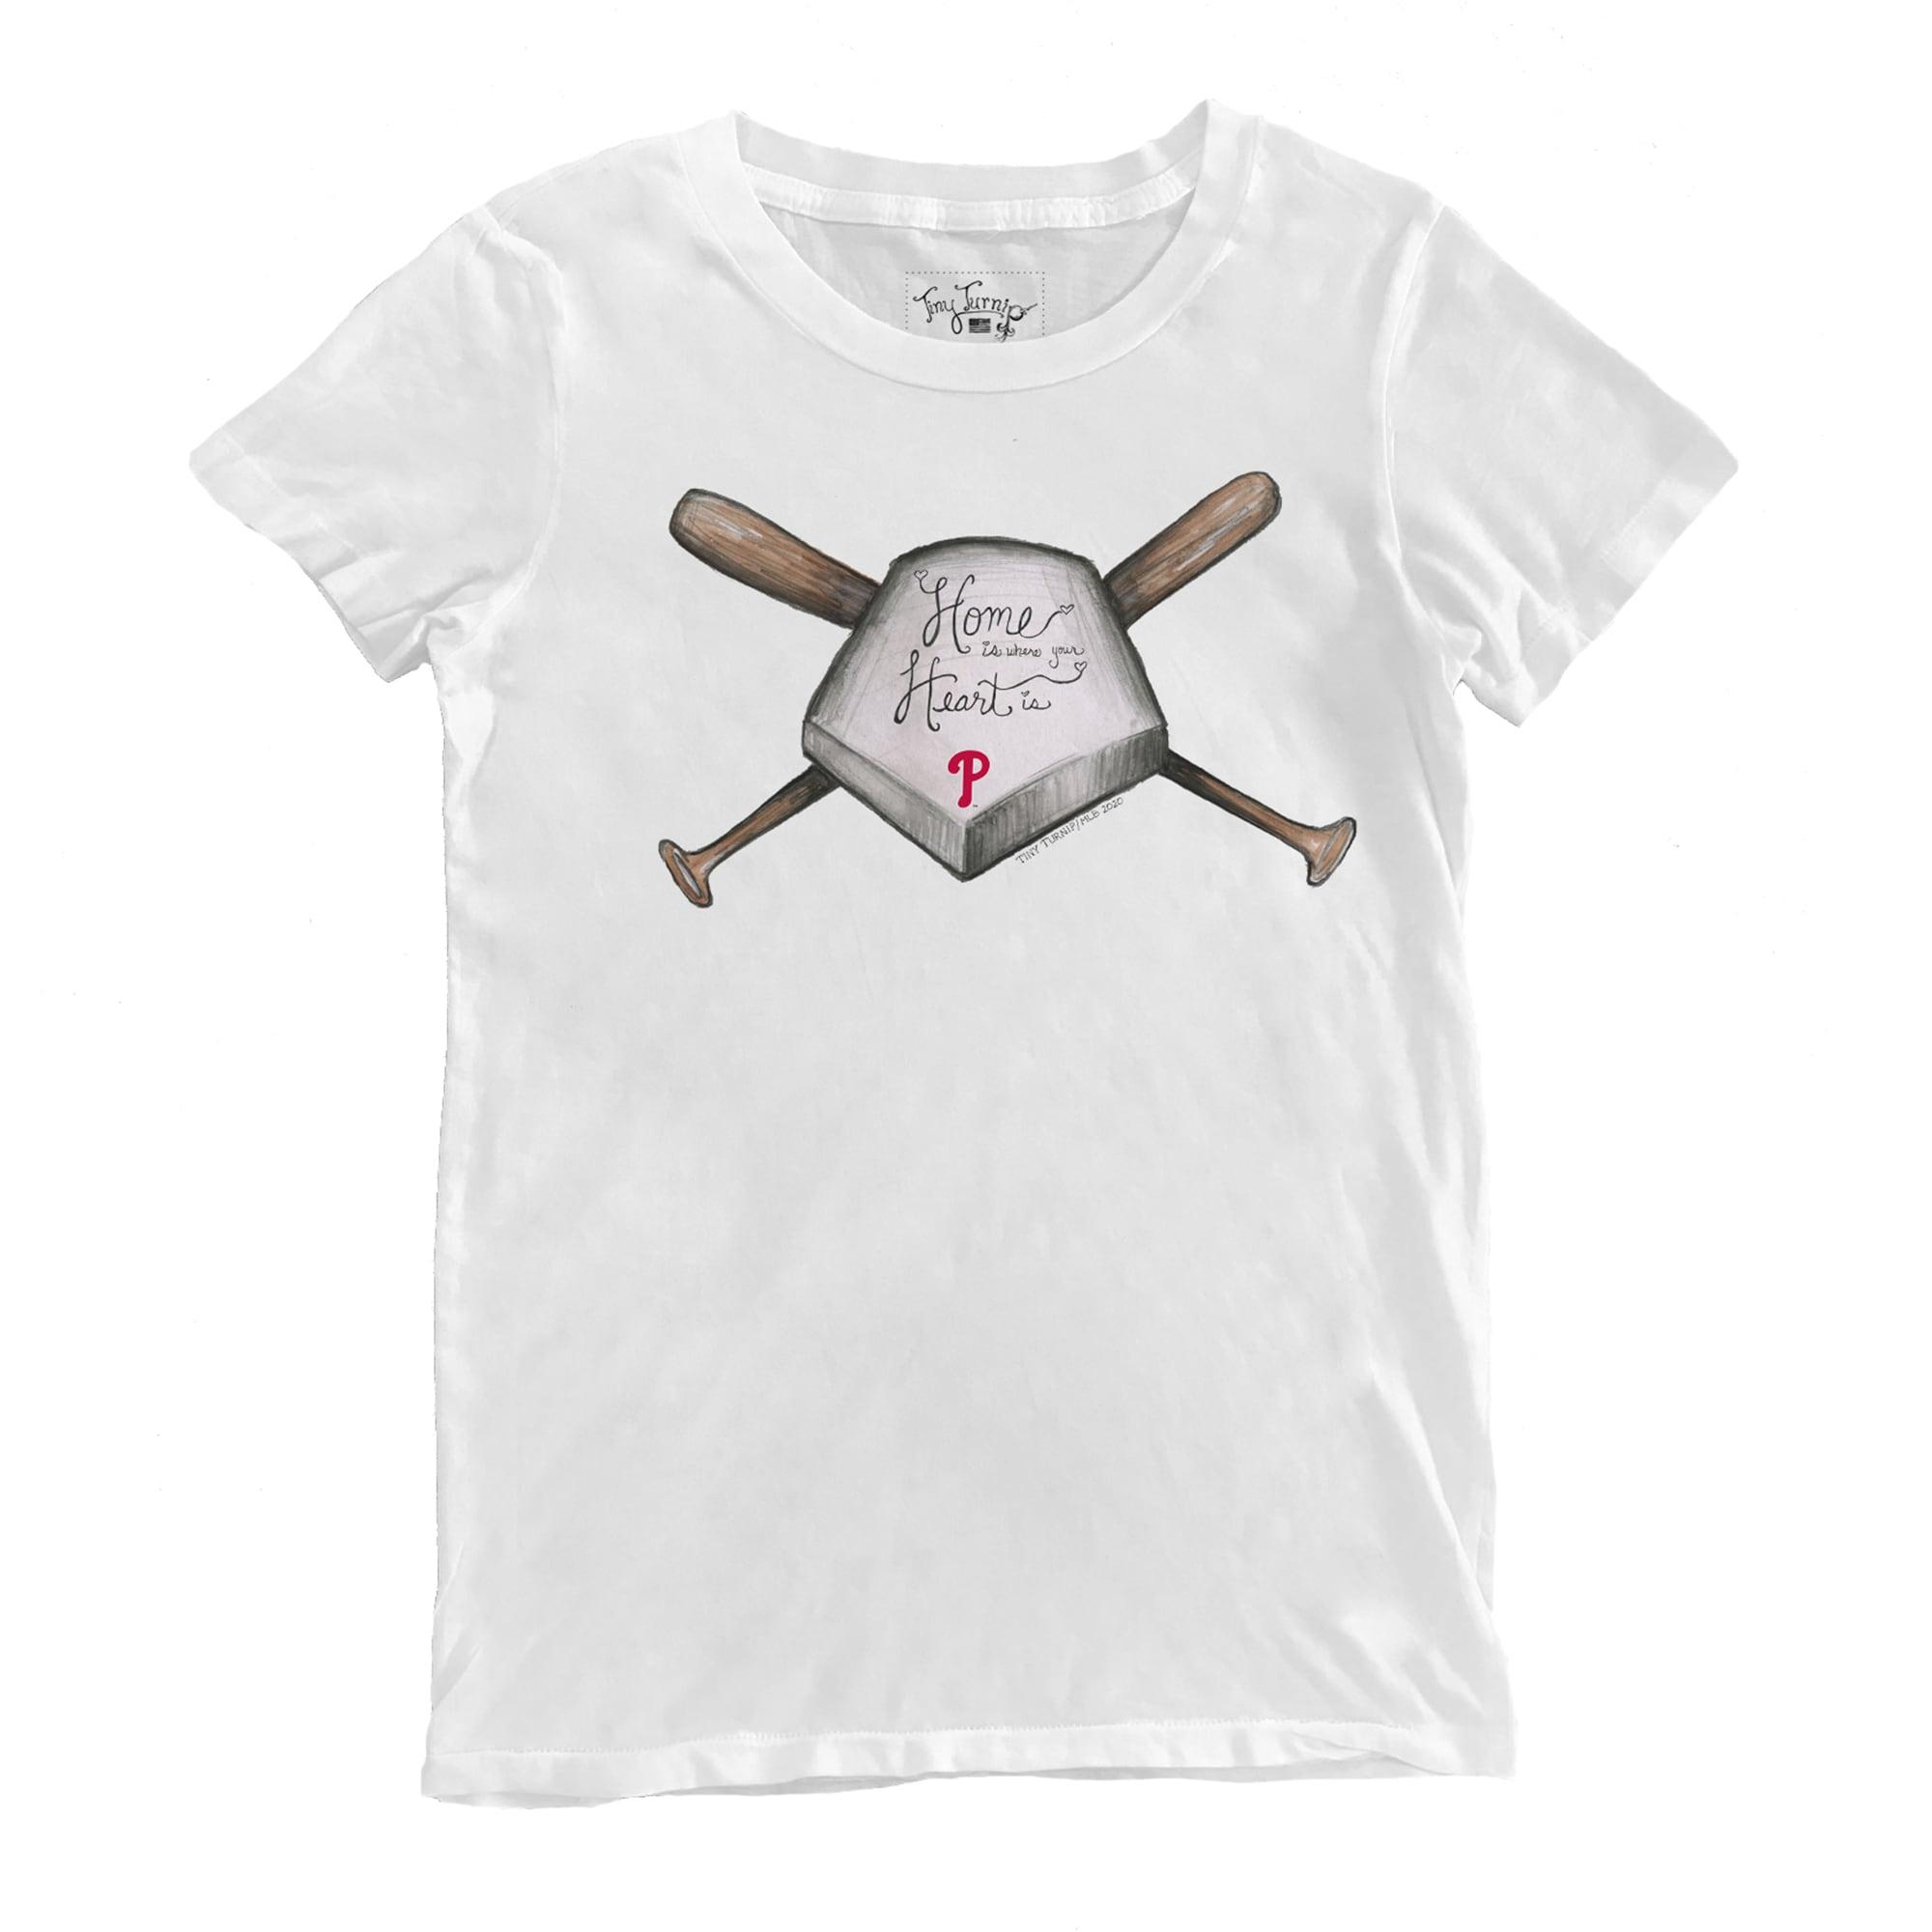 Philadelphia Phillies Tiny Turnip Women's Home Is Where Your Heart Is T-Shirt - White